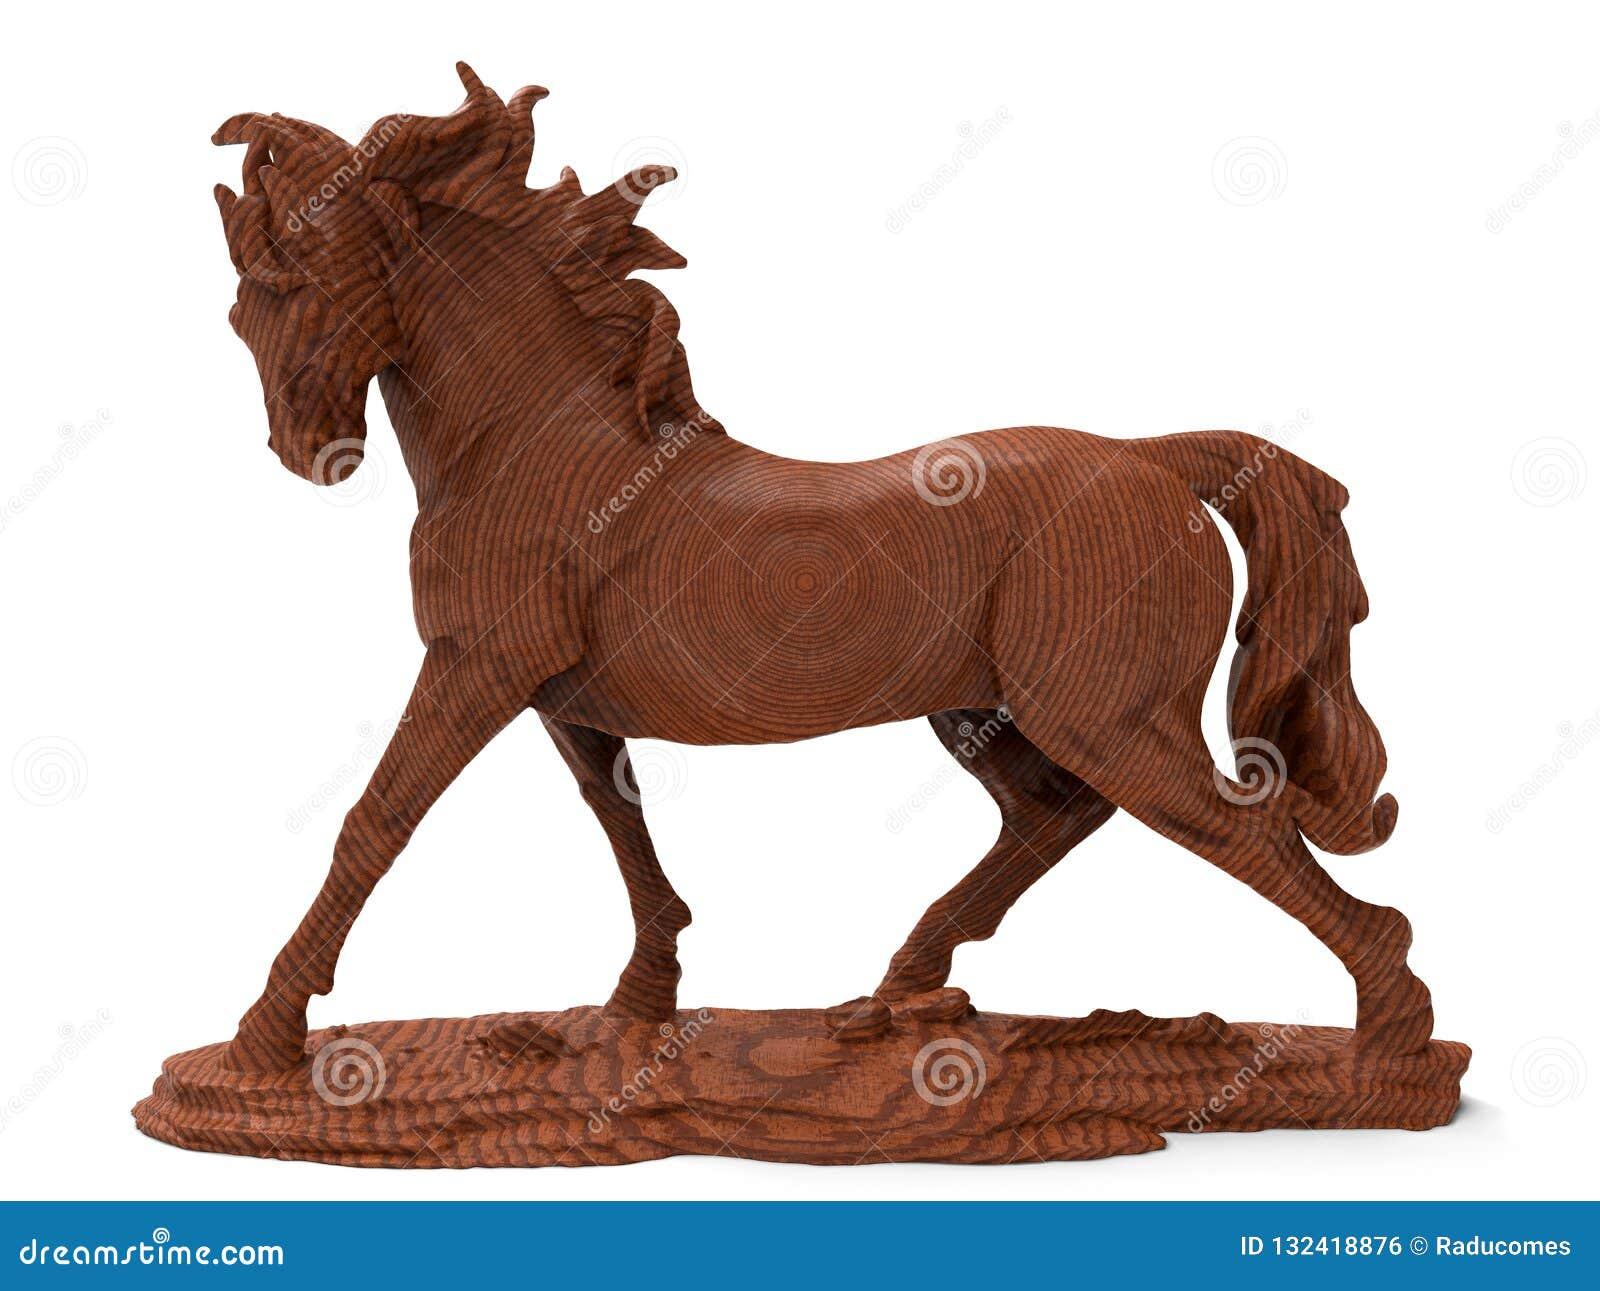 3d Render Wooden Horse Sculpture Stock Illustration Illustration Of Arabian Isolated 132418876